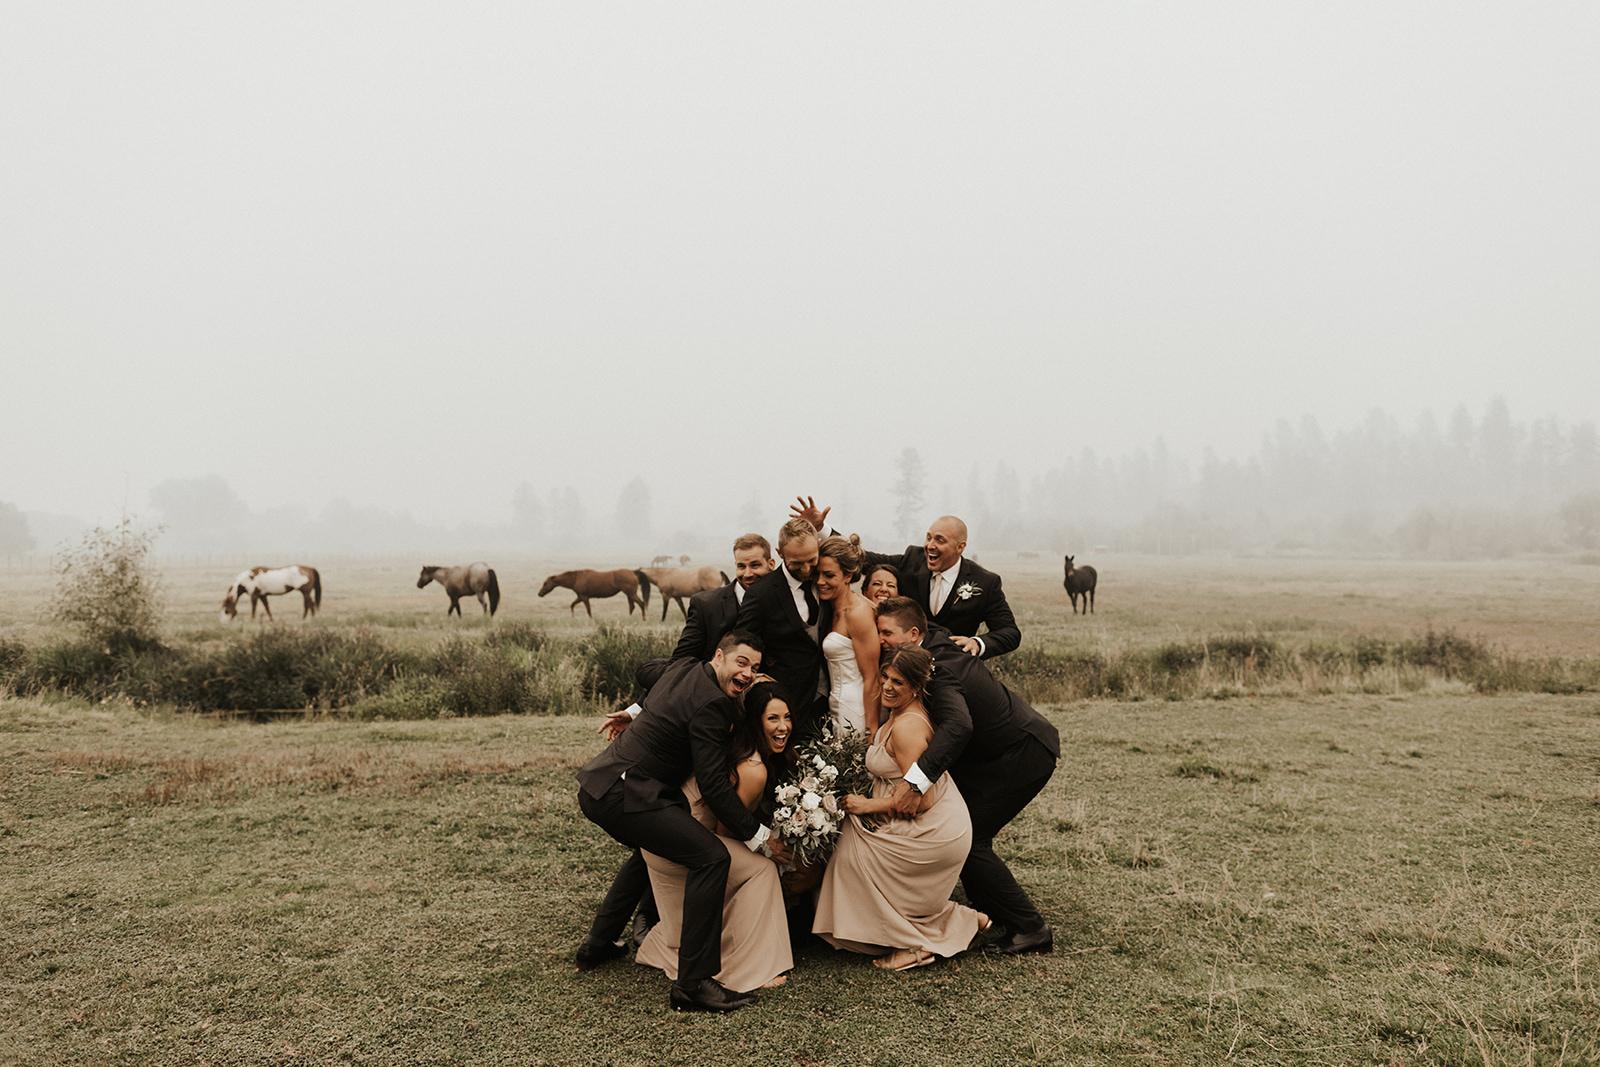 weddingparty_briannarecordphotography-26_websize.jpg